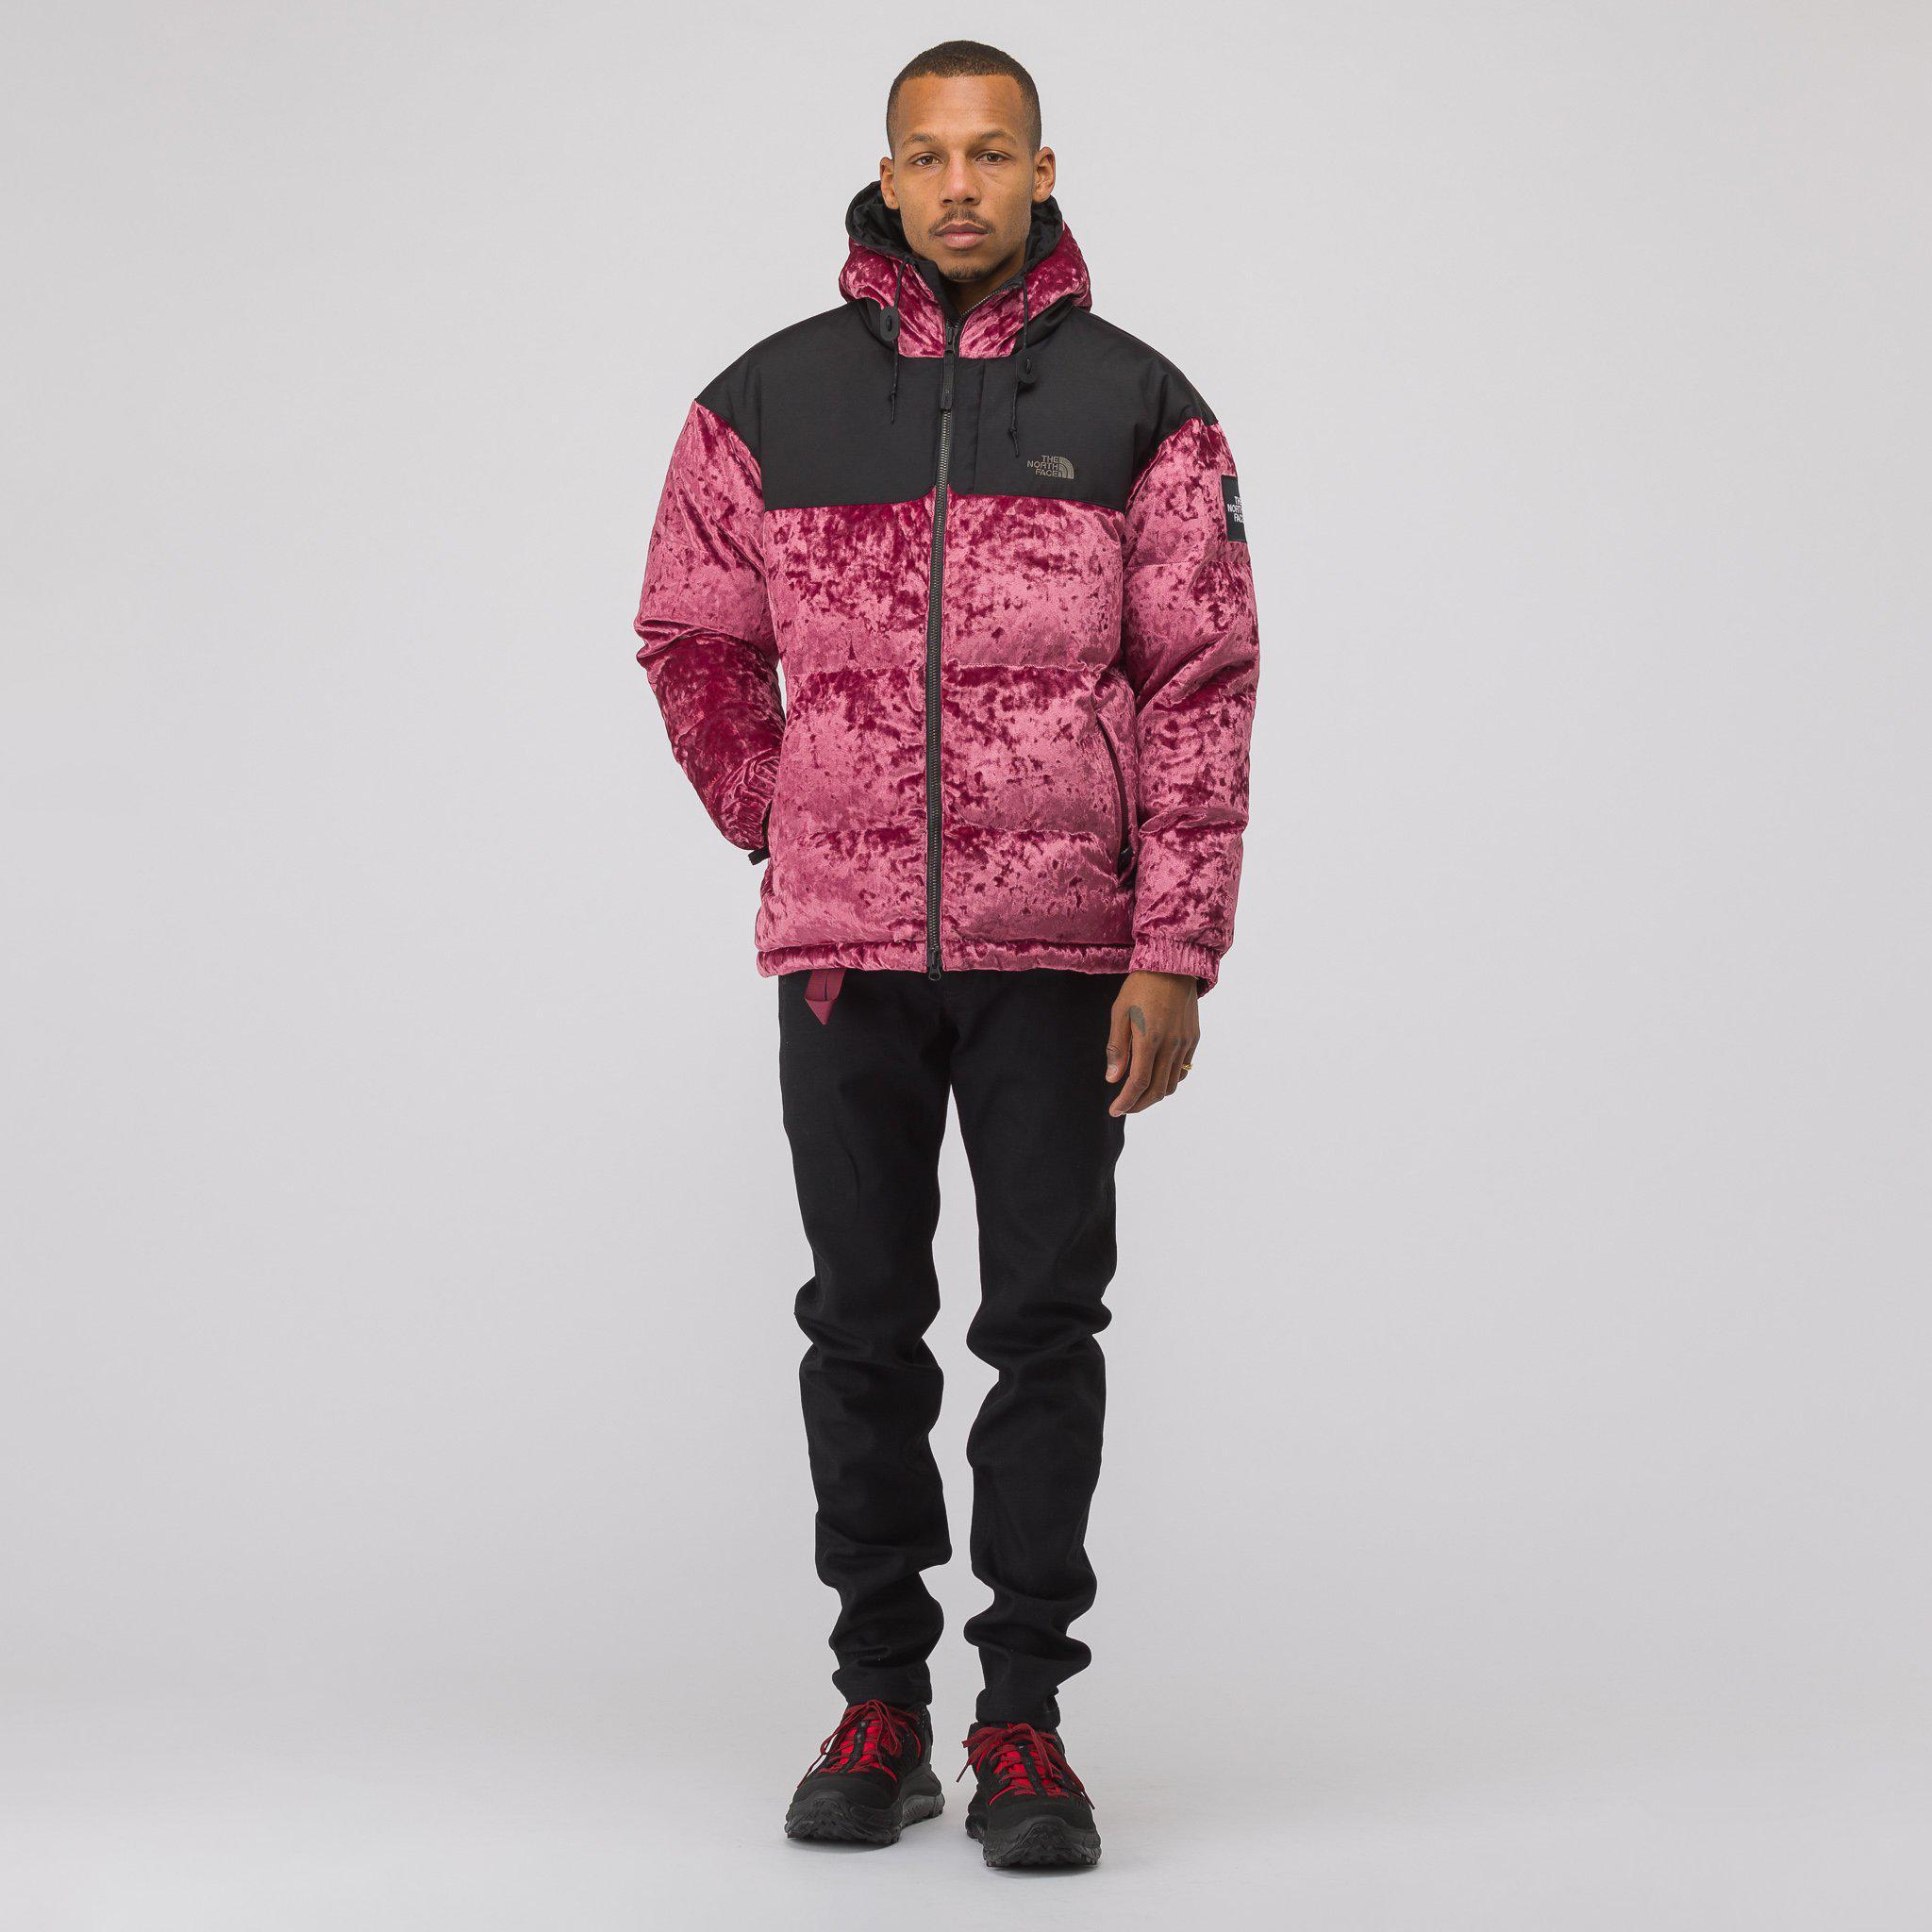 6c1d068fb The North Face Velvet Nuptse Jacket In Regal Red for men